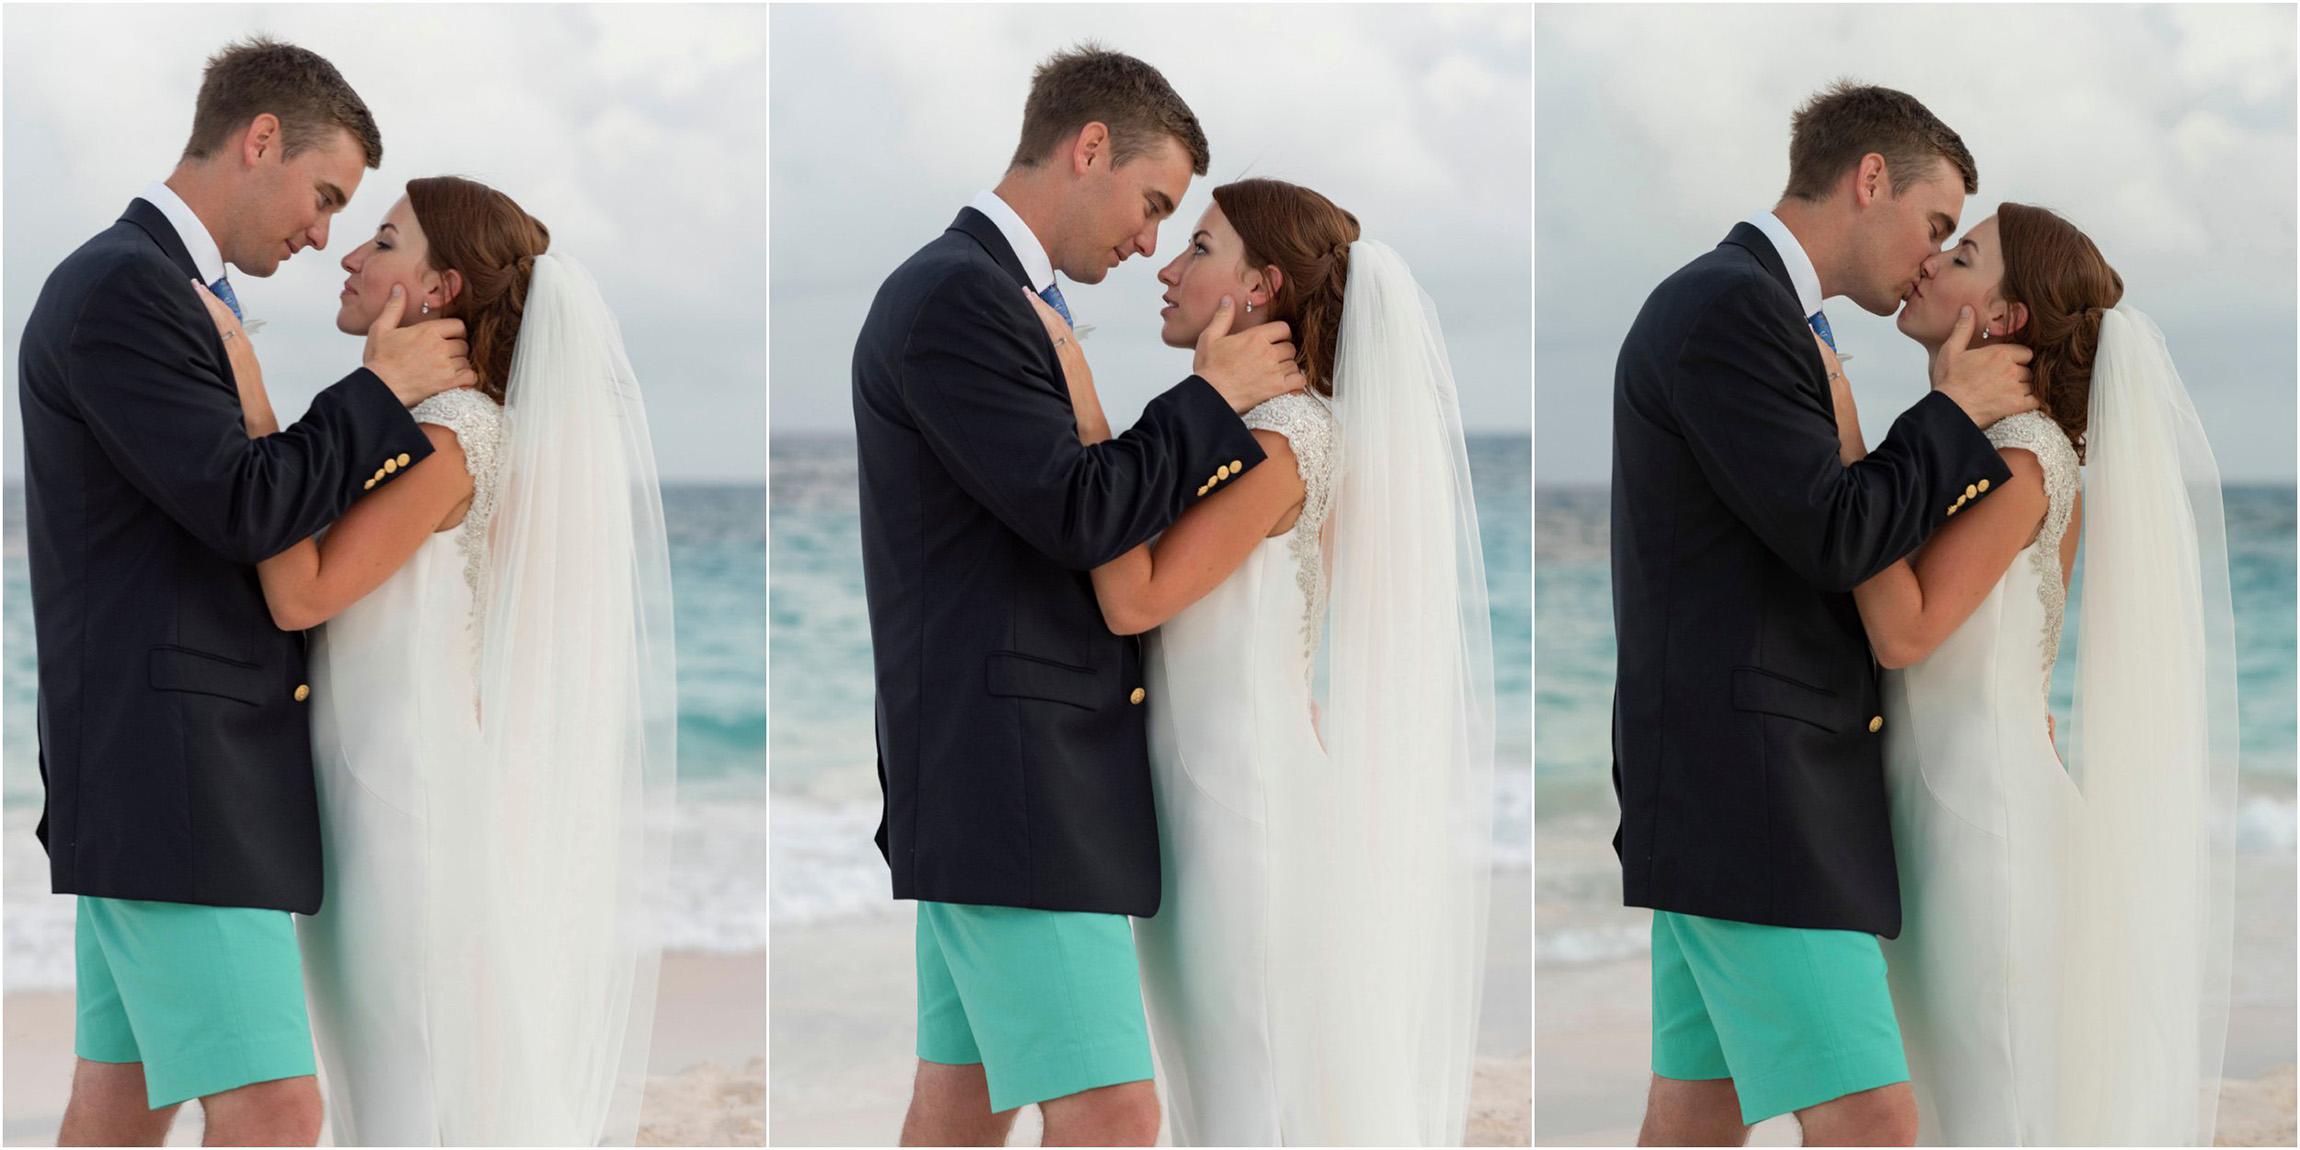 ©FianderFoto_Bermuda Wedding Photographer_Mid Ocean_Rachel_Angus_073.jpg